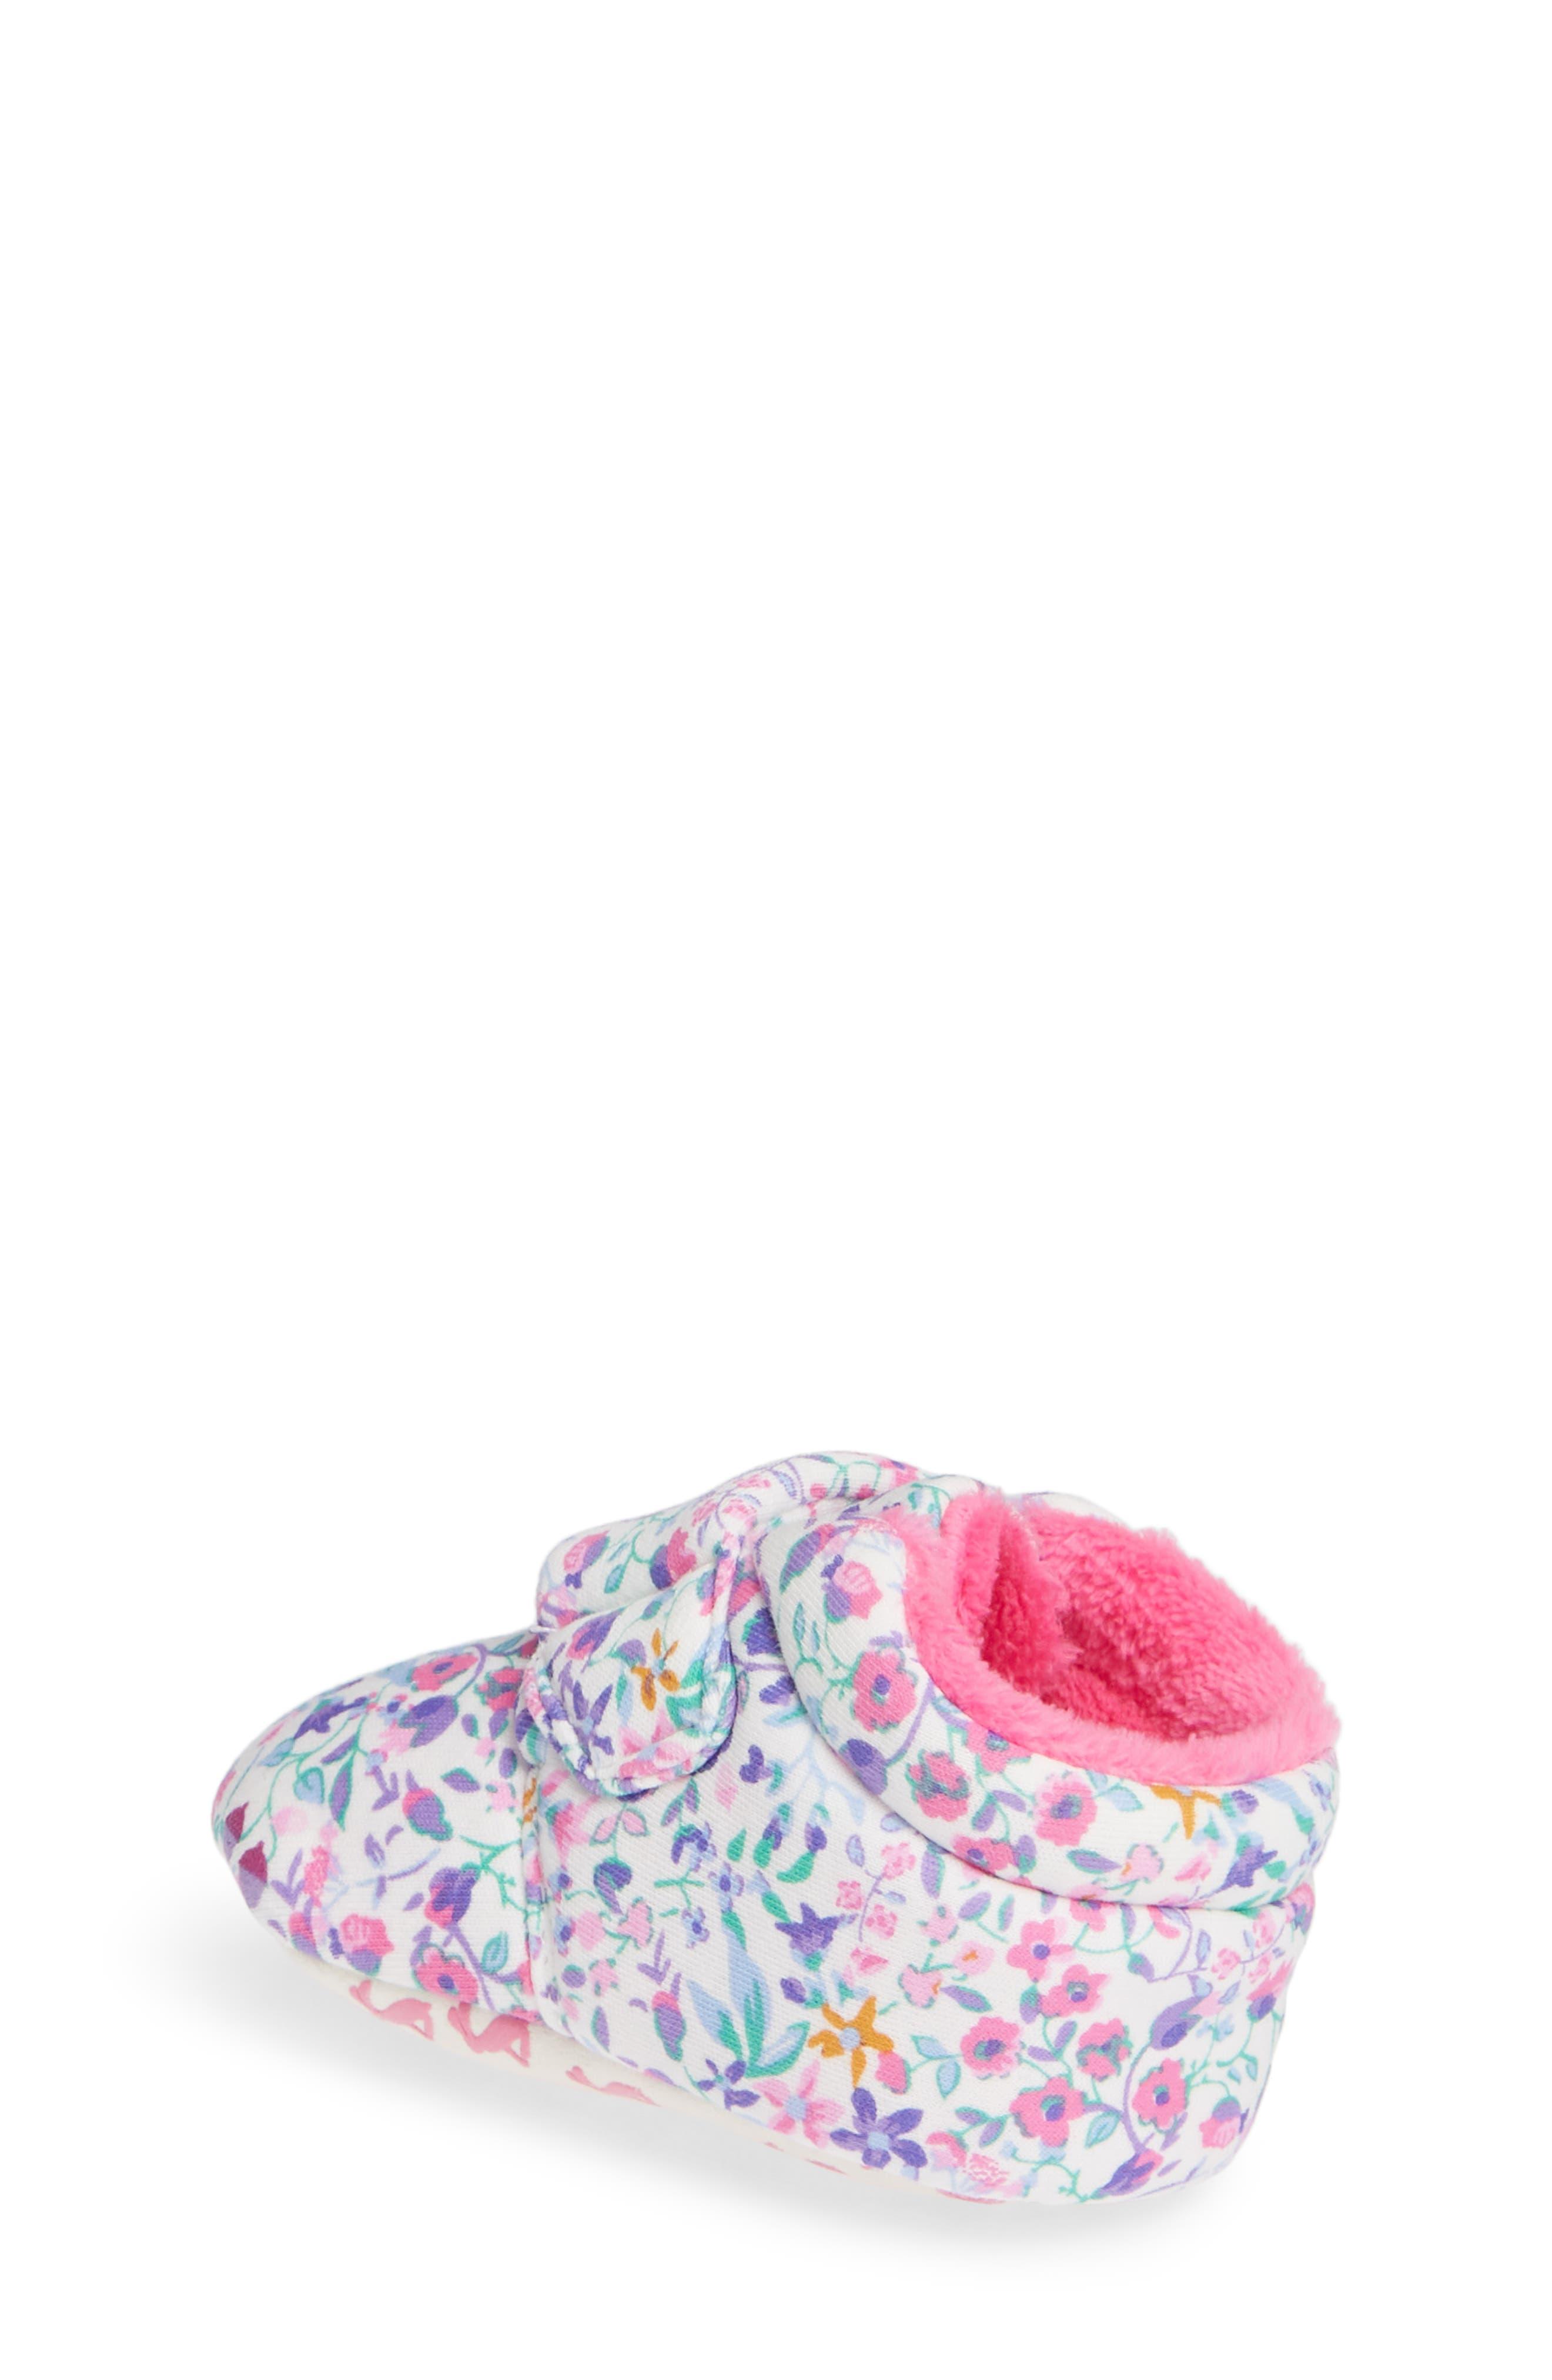 Crib Shoe,                             Alternate thumbnail 2, color,                             ACORN DITSY